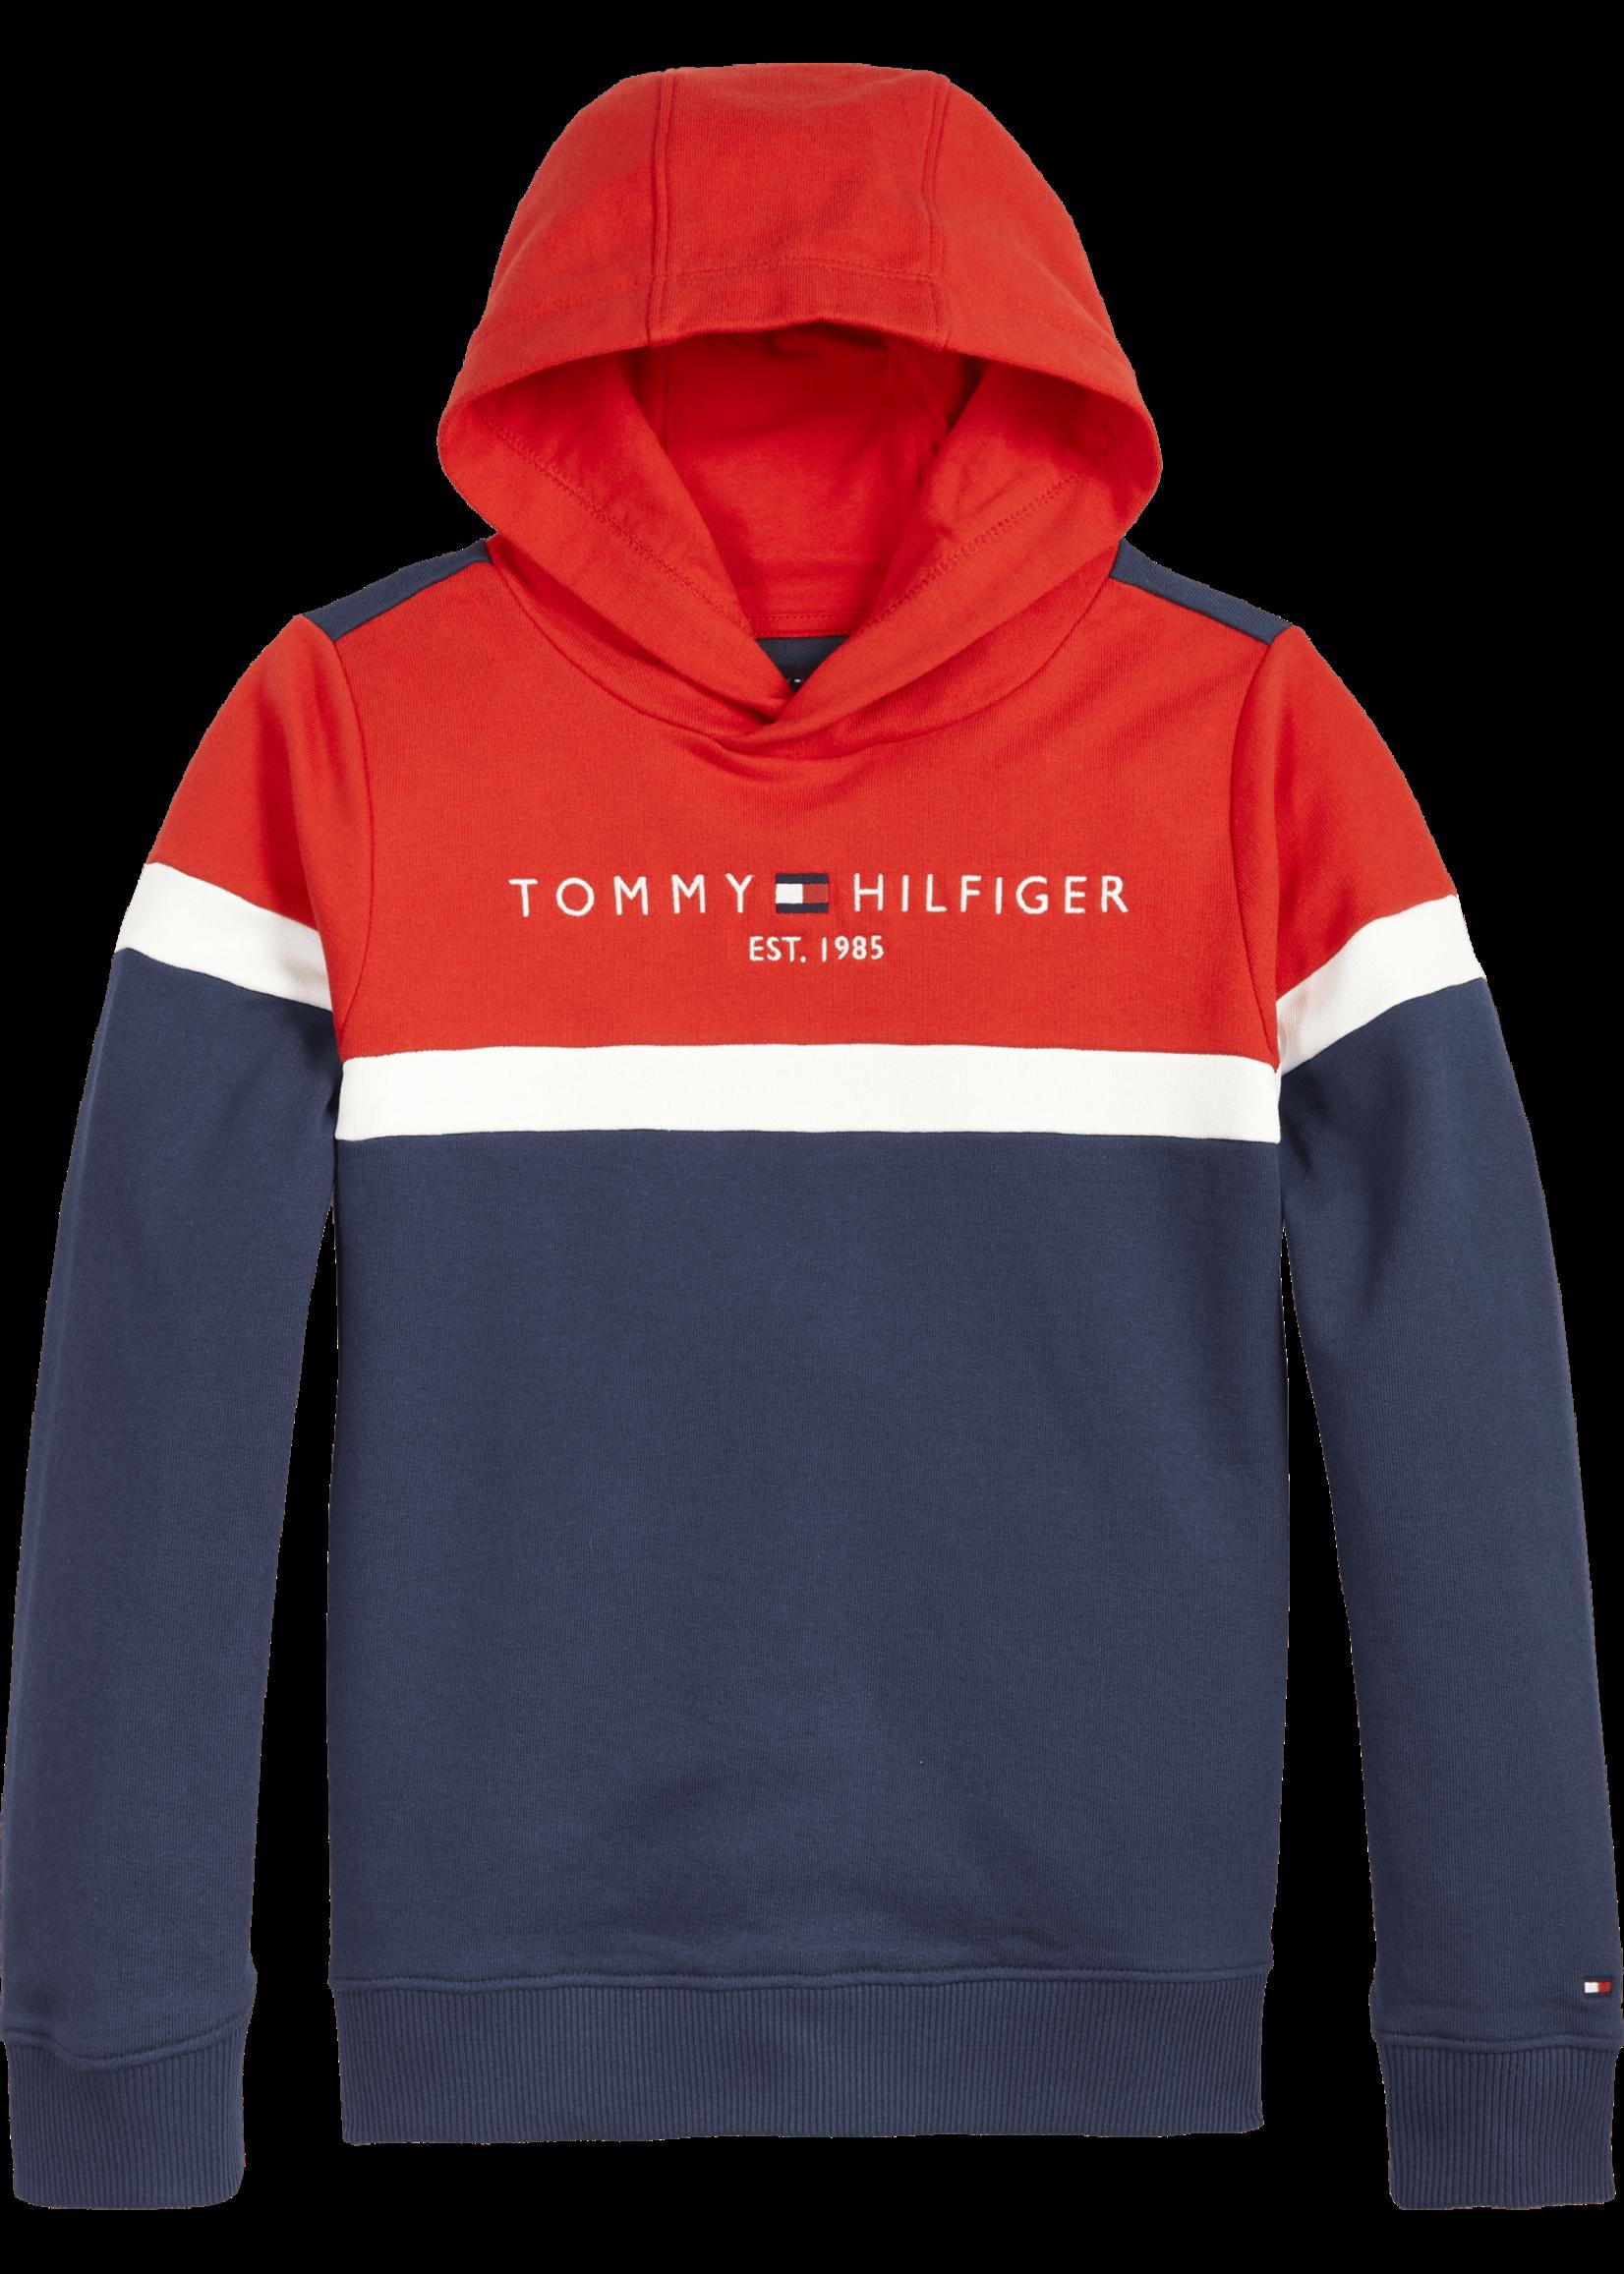 TOMMY HILFIGER TOMMY HILFIGER Hoodie colorblock twilight navy